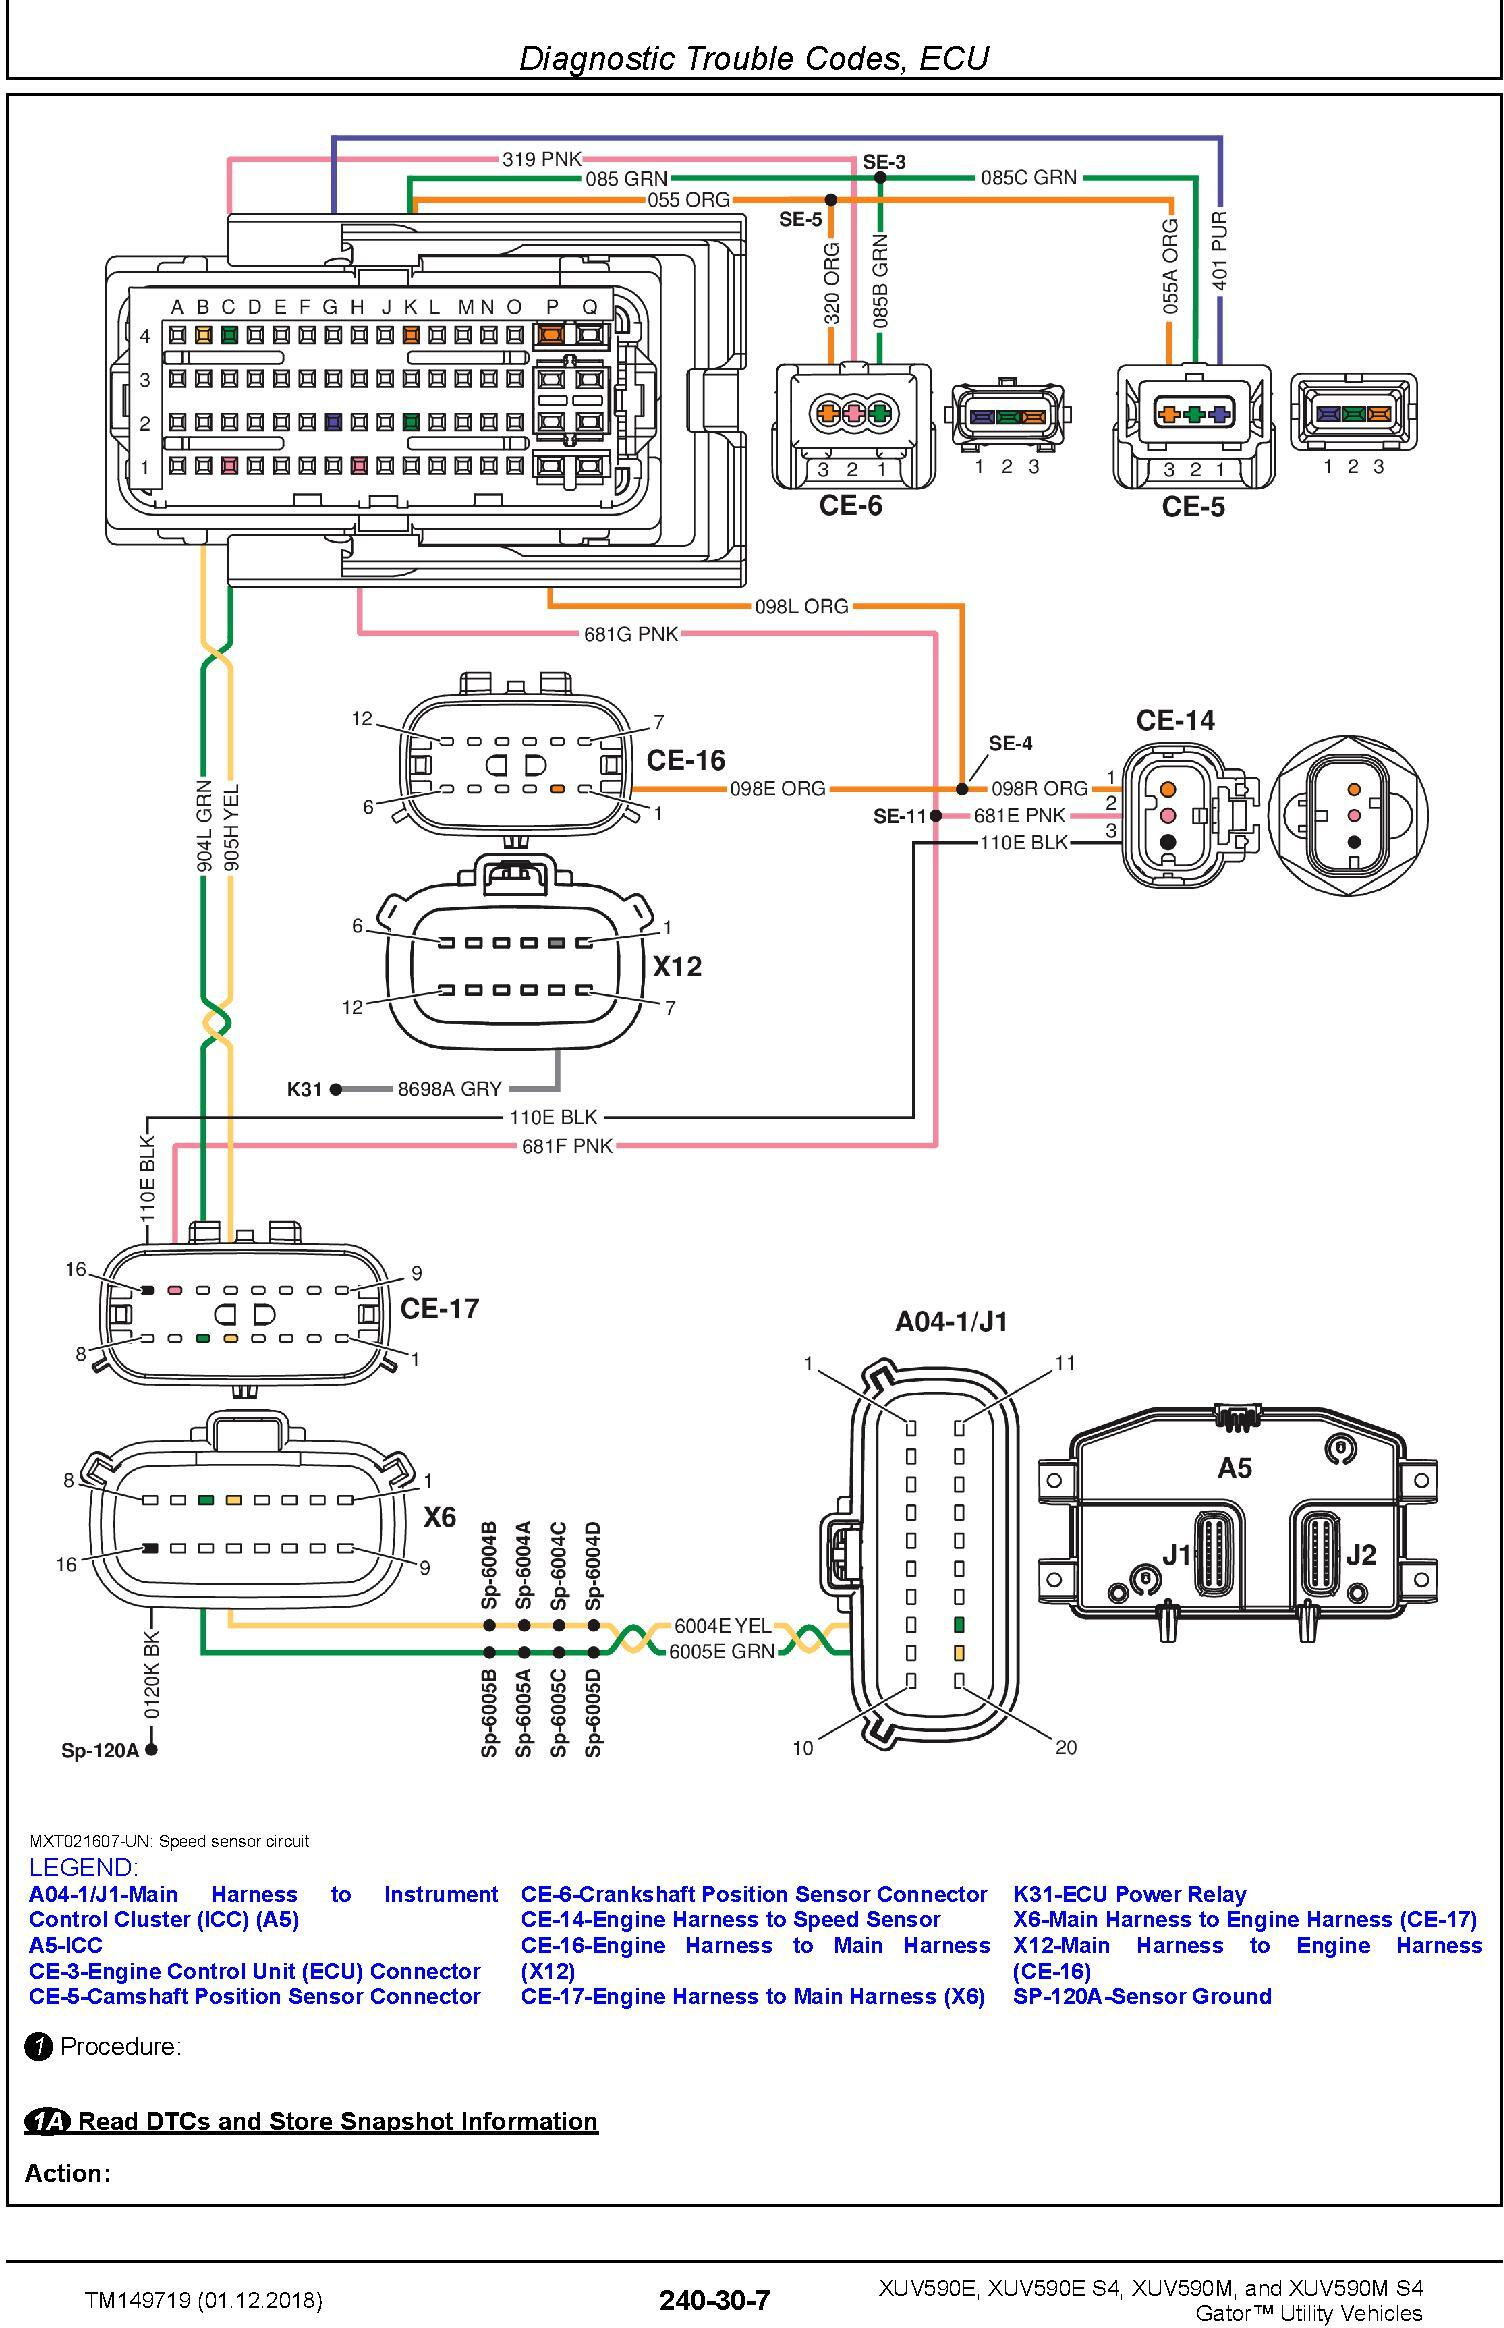 John Deere XUV590E(S4), XUV590E(S4) Gator Utility Vehicles (SN. 010001-) Technical Manual (TM149719) - 1